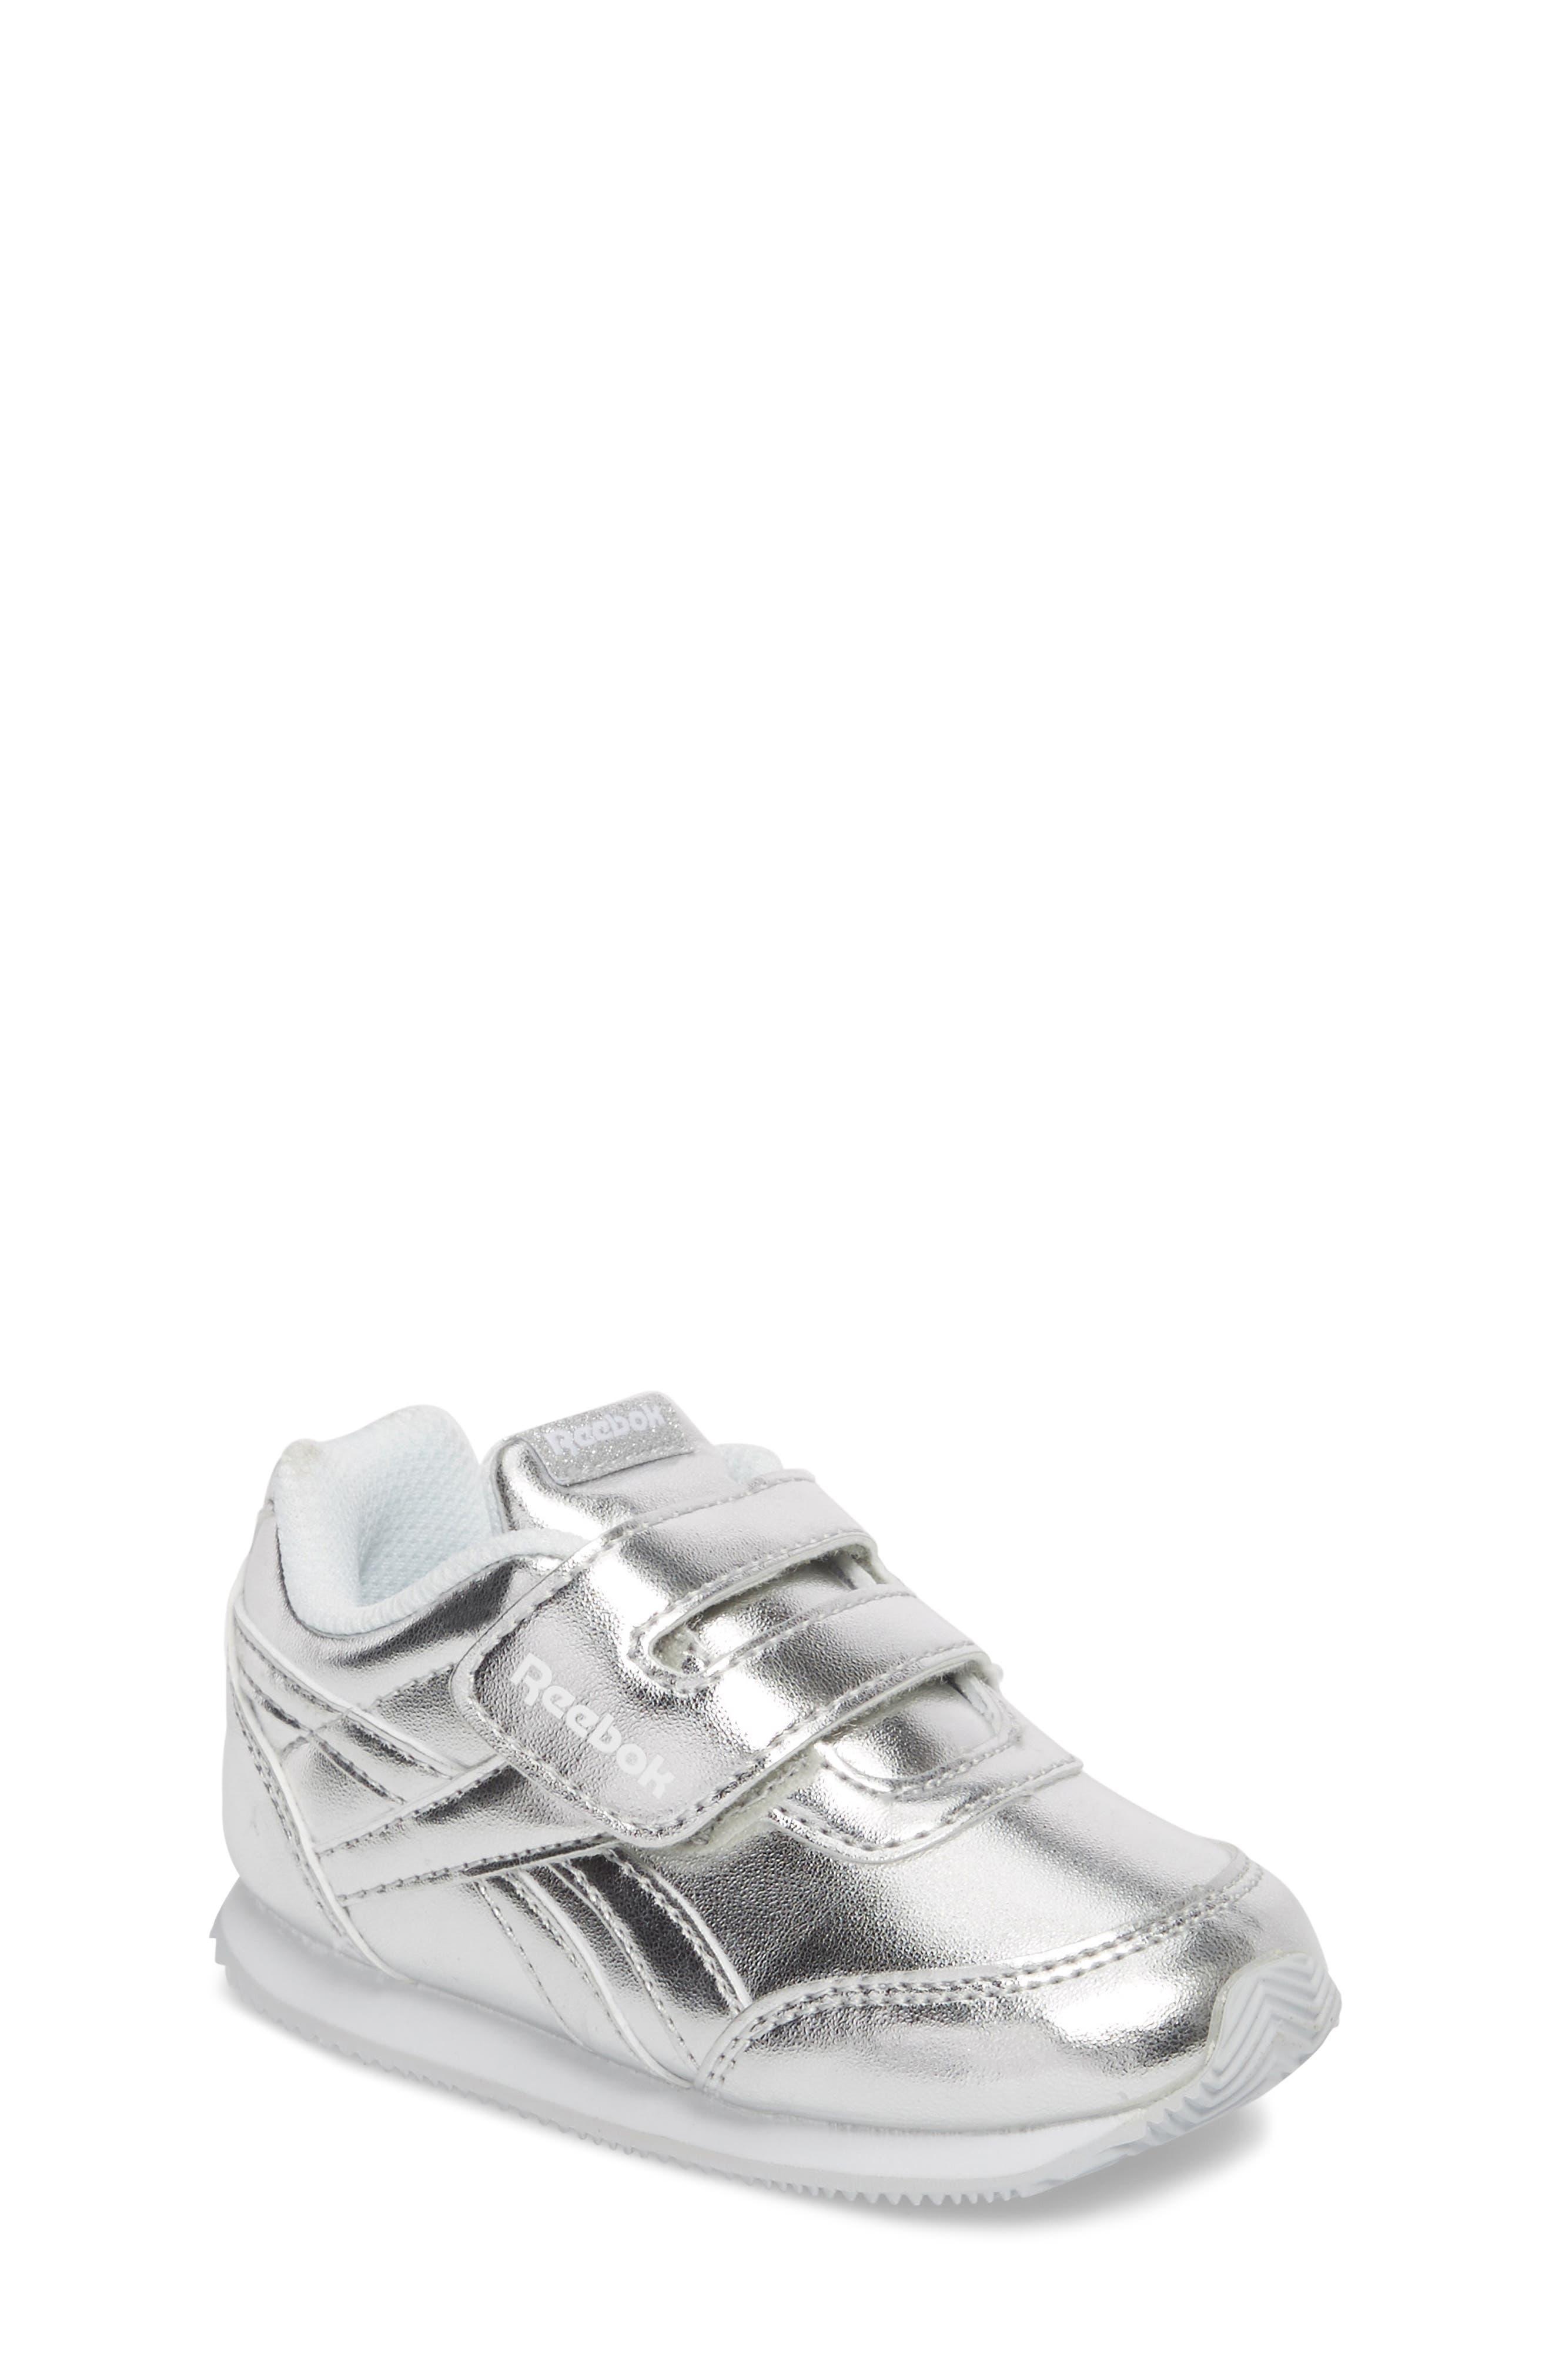 Royal Classic Jogger 2 Sneaker,                             Main thumbnail 1, color,                             040